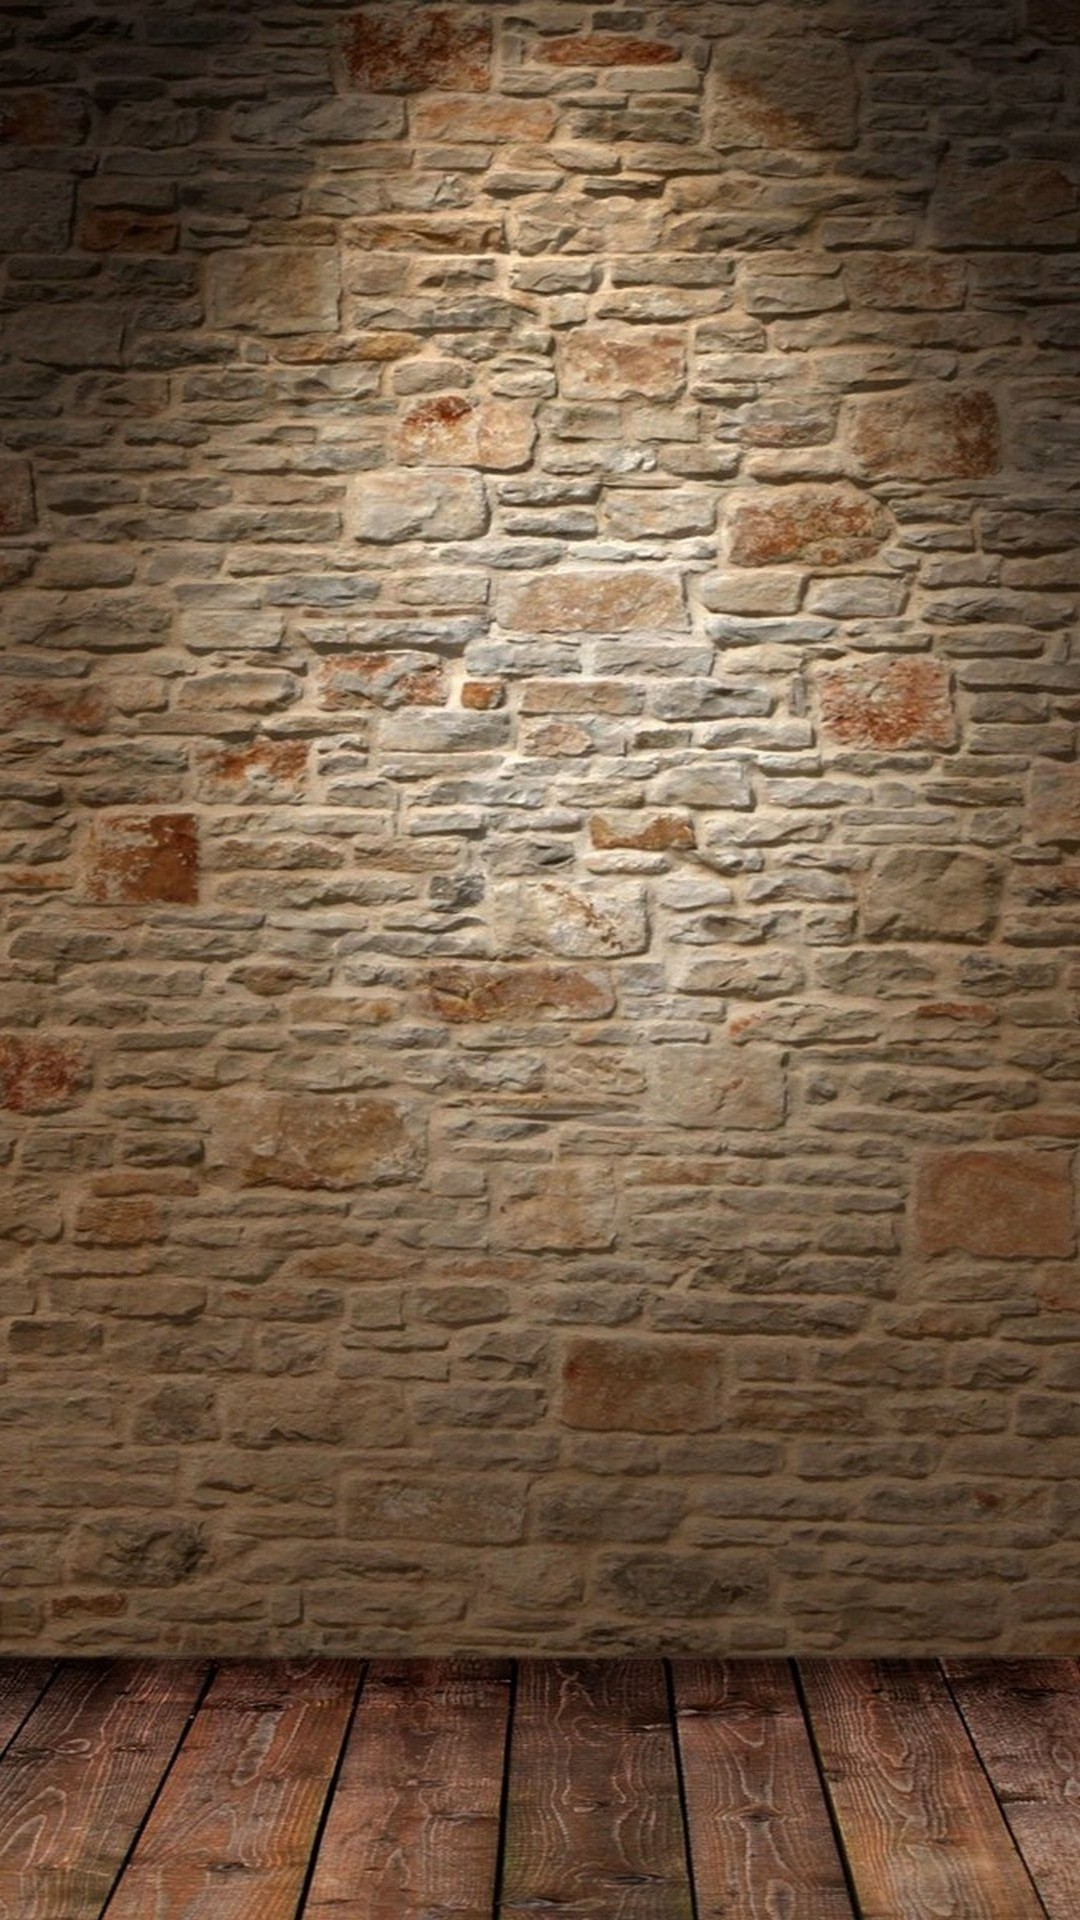 Brick wall and wood floor Digital Art mobile wallpaper